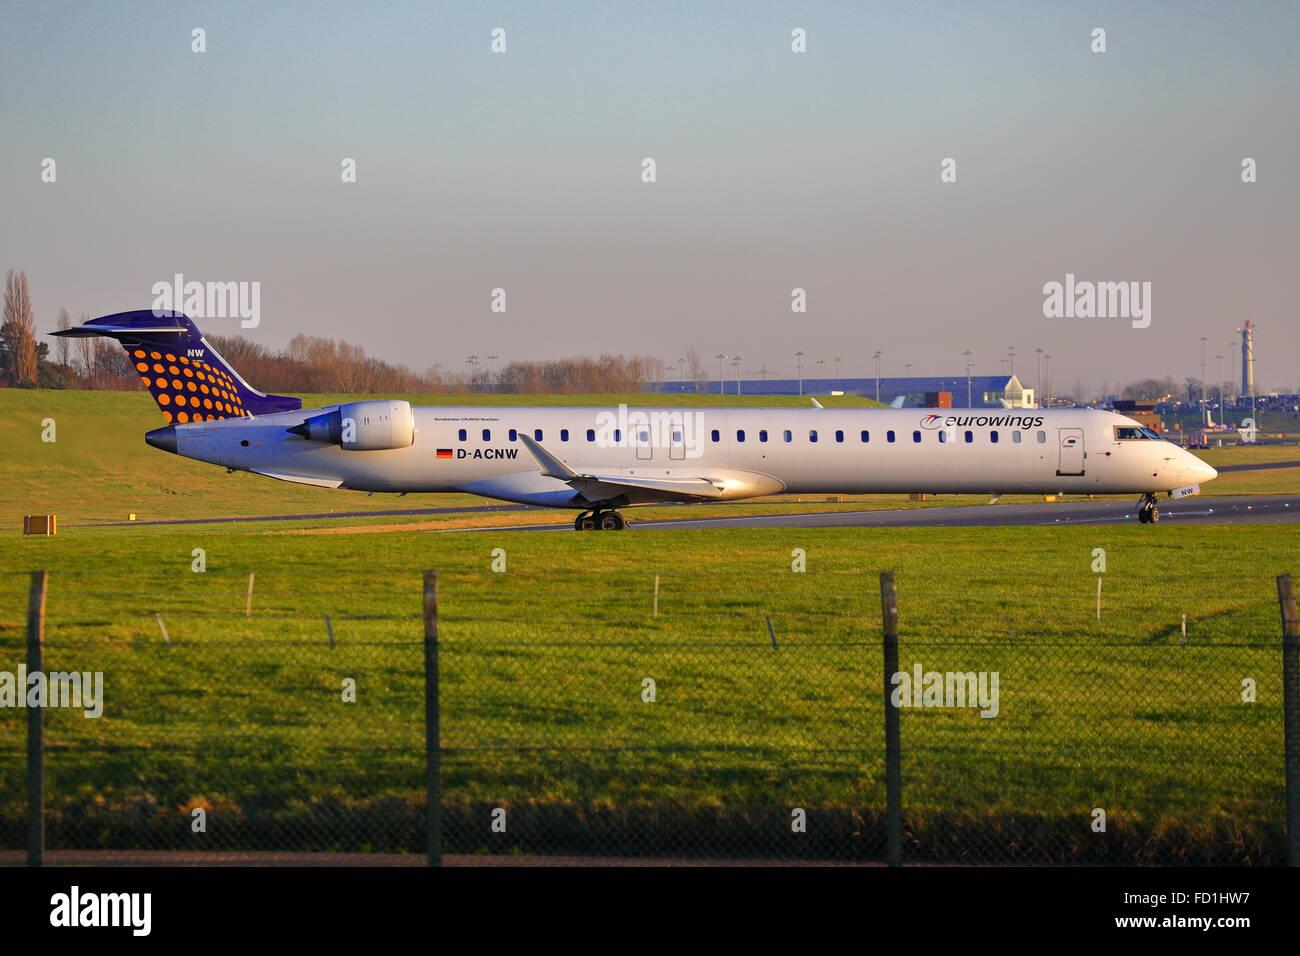 Eurowing Canadair CRJ-900 D-ACNW taking off at Birmingham Airport, UK - Stock Image